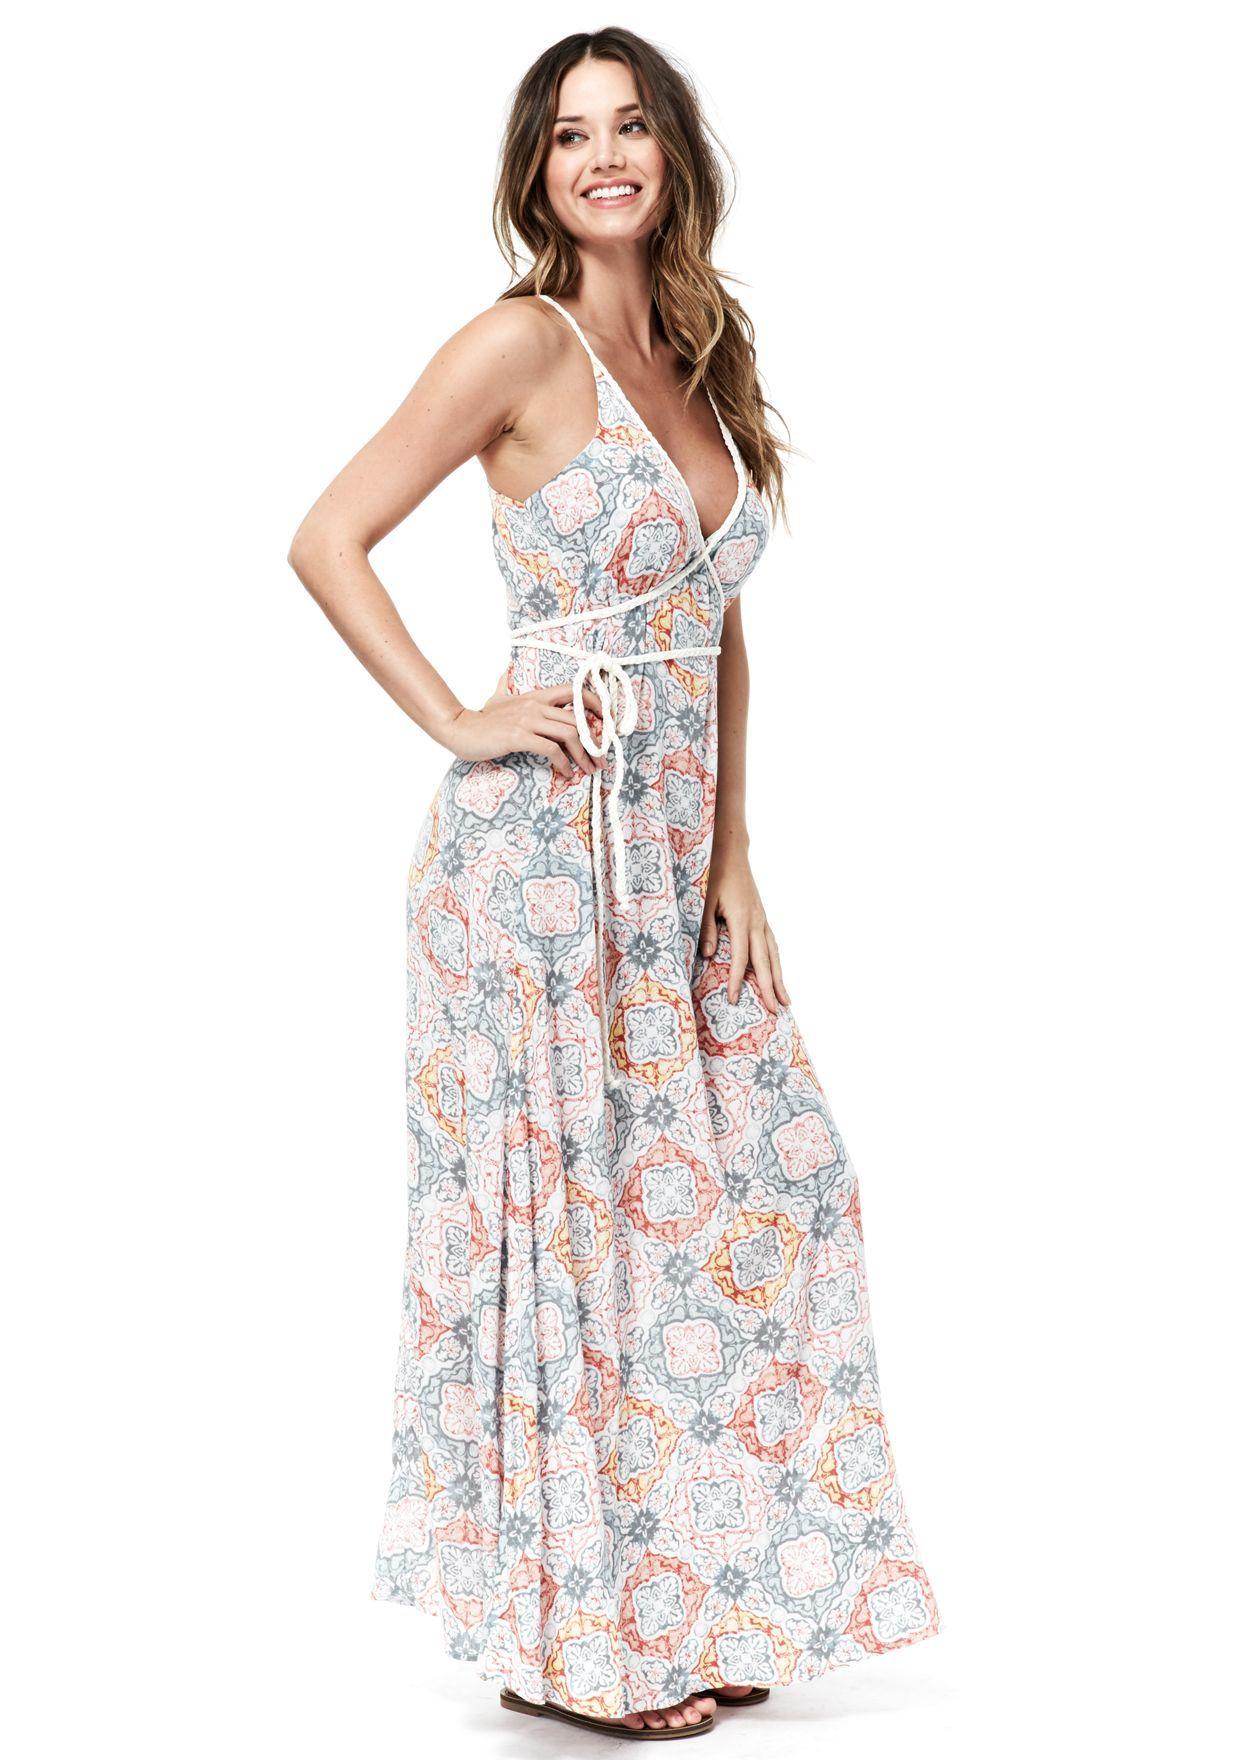 Cruise wear maxi dresses